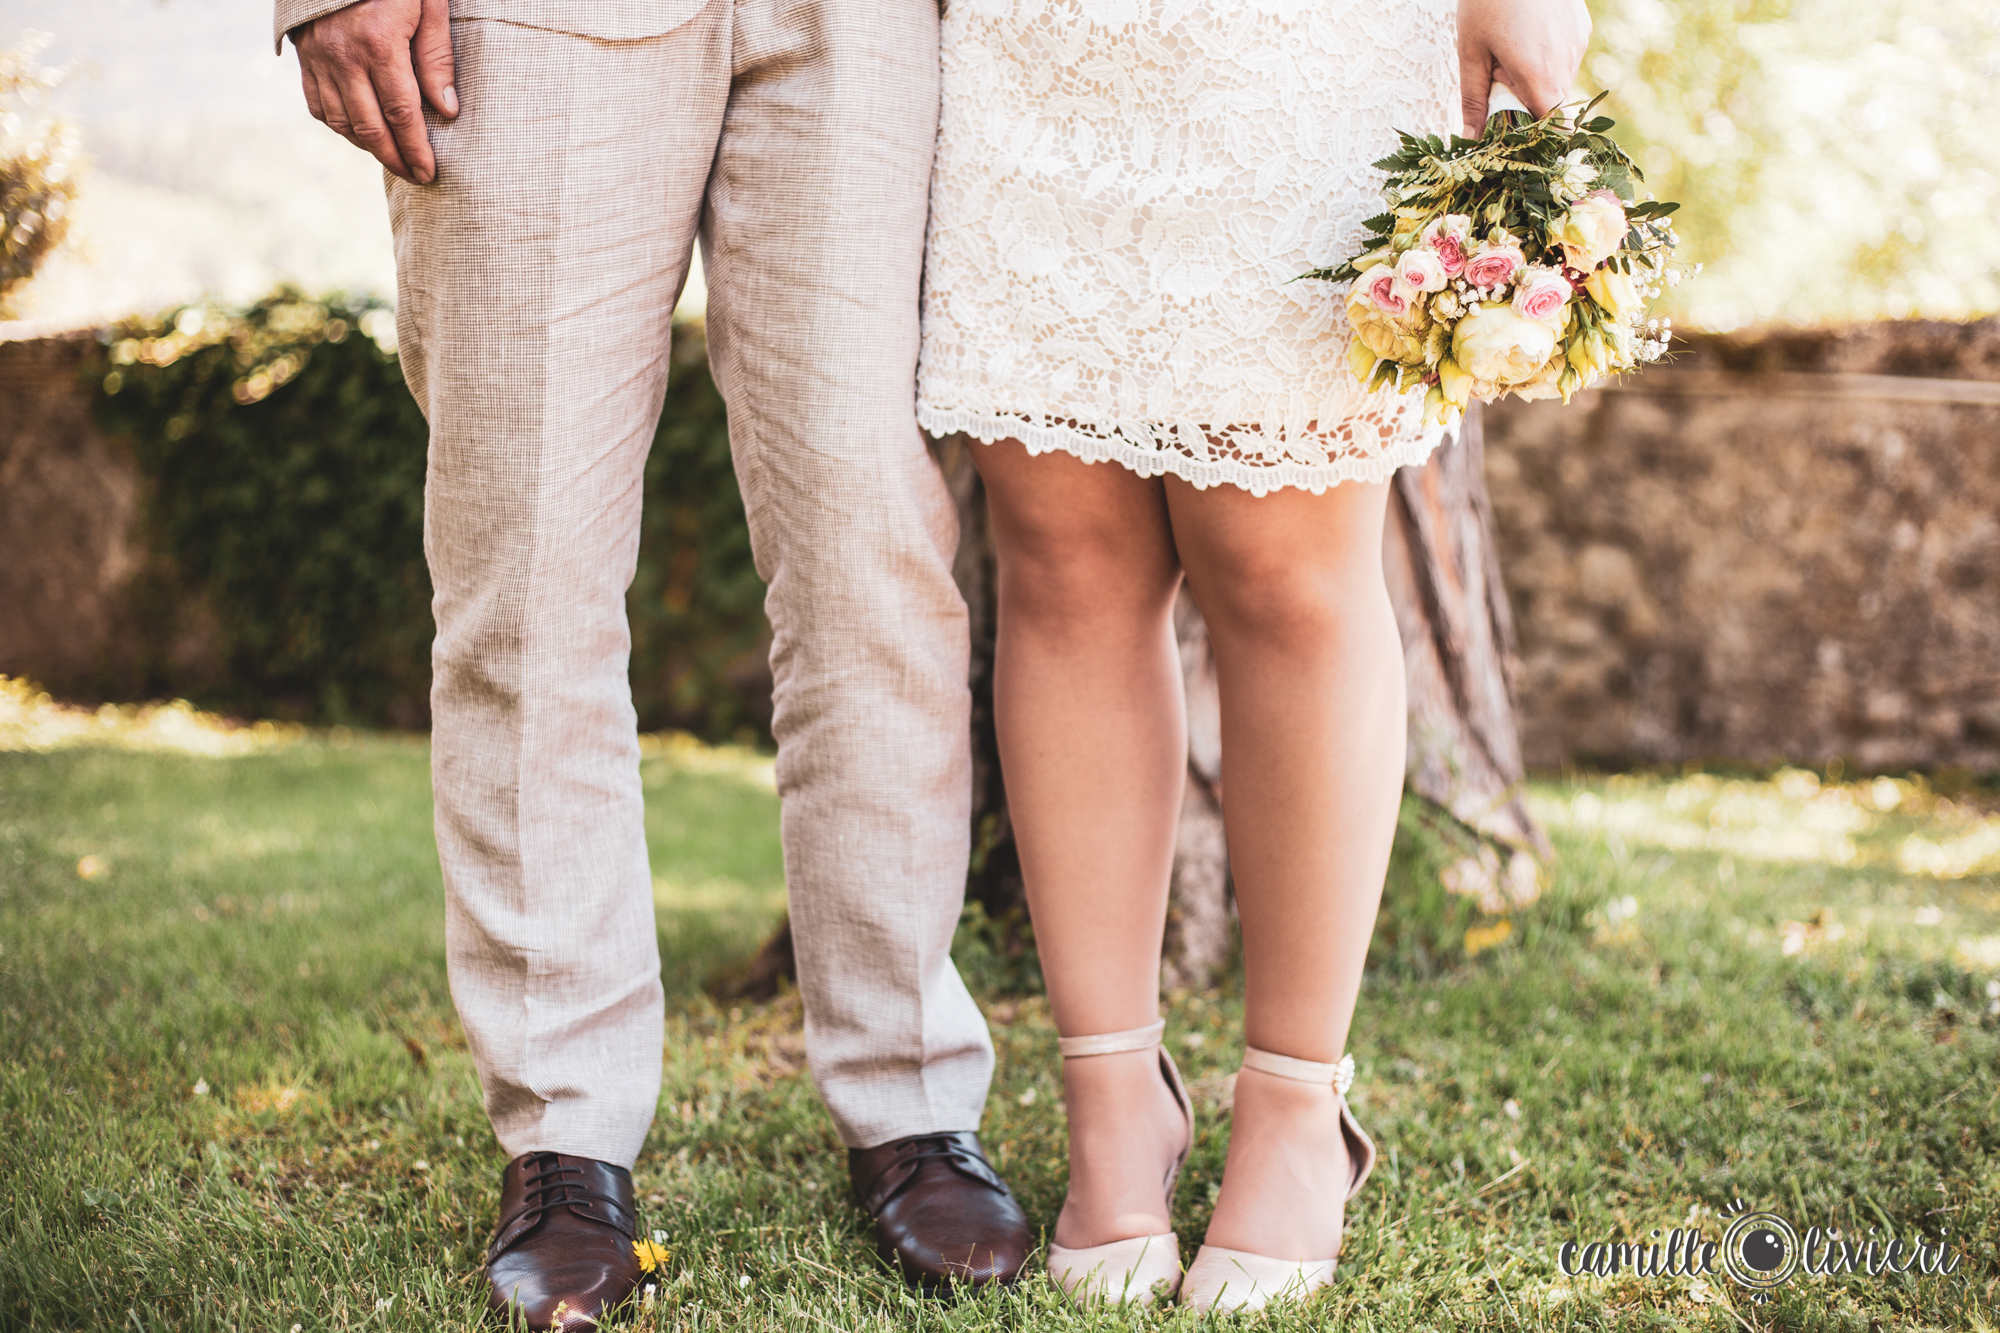 photographe_grenoble_mariage-camille-olivieri-58